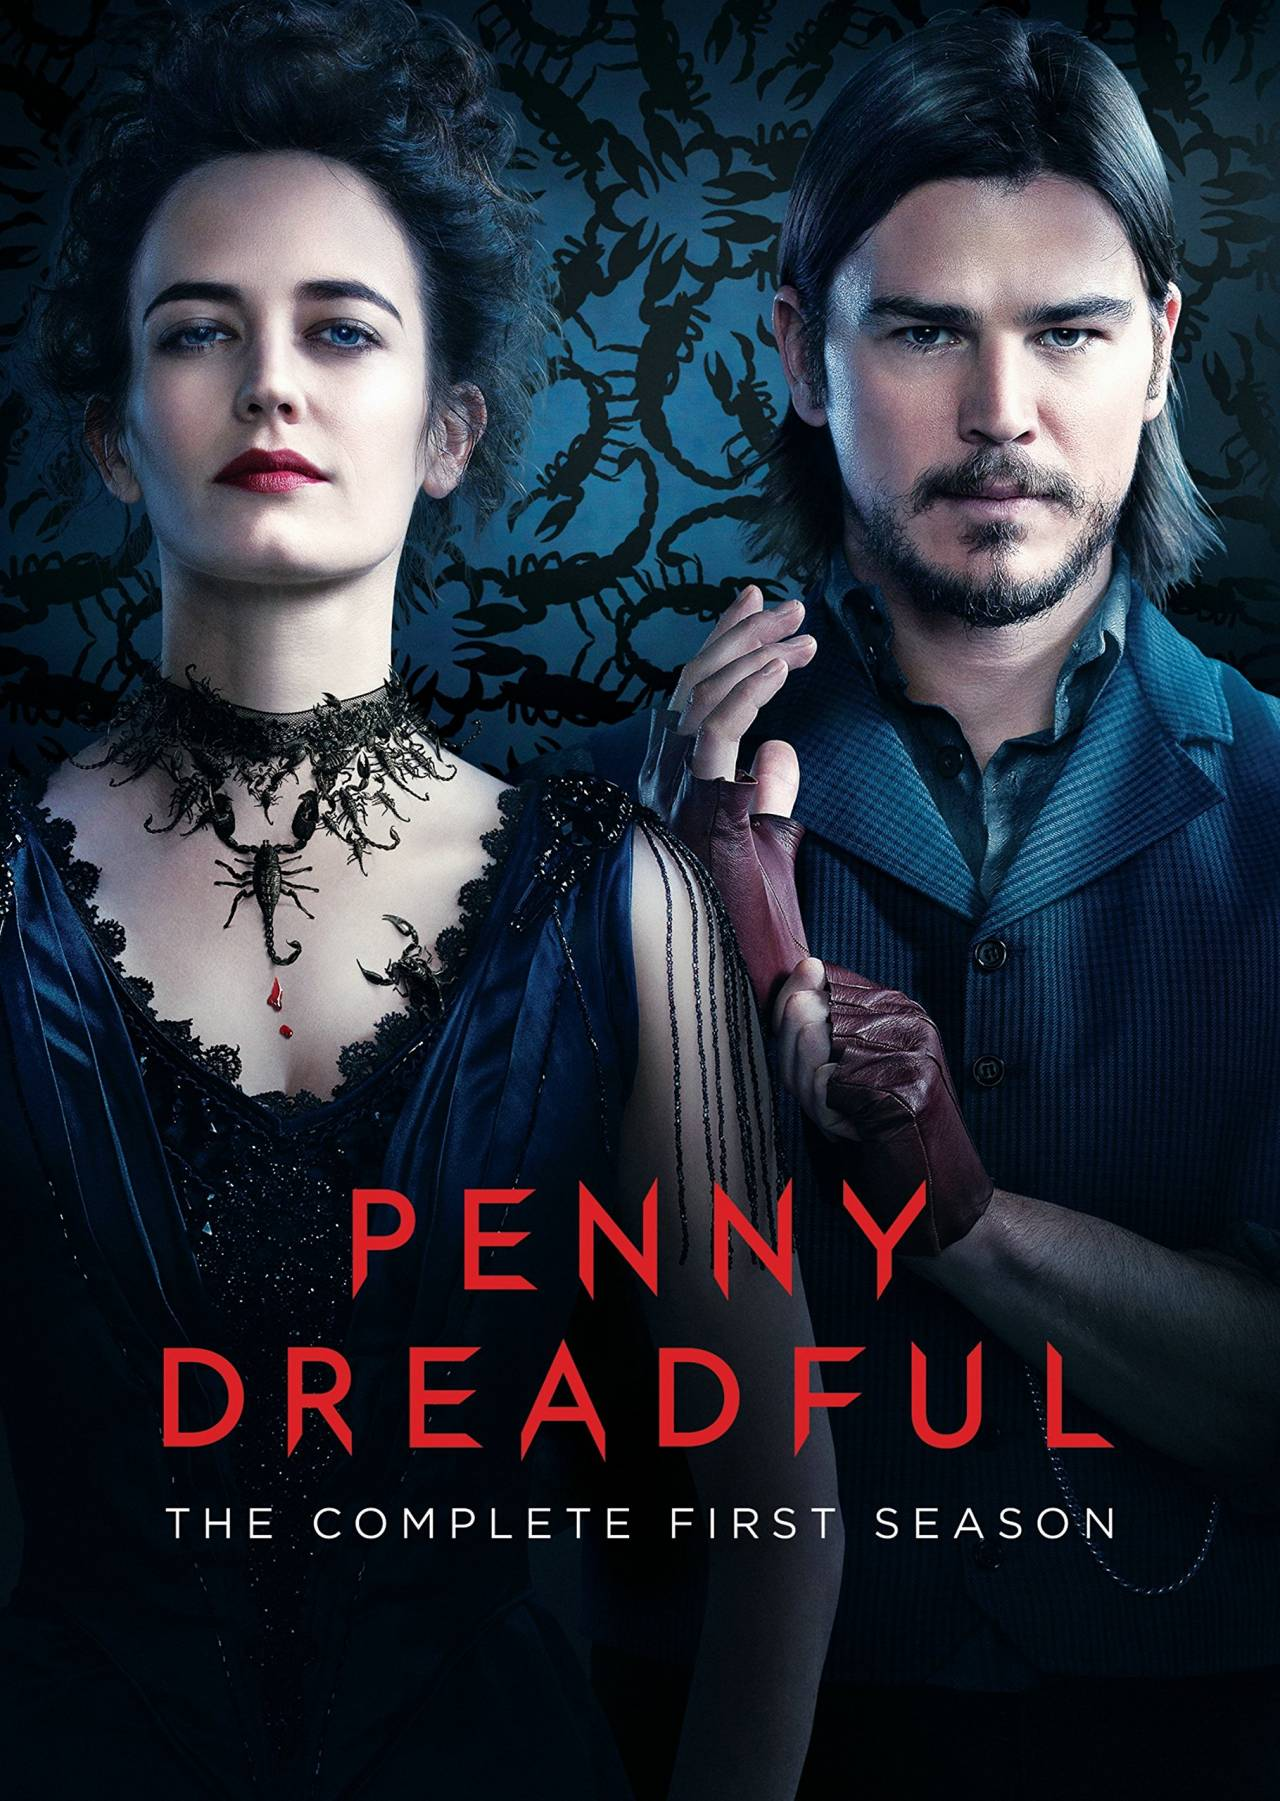 150415_414892_penny-dreadful-season-1-dvd-cover-11